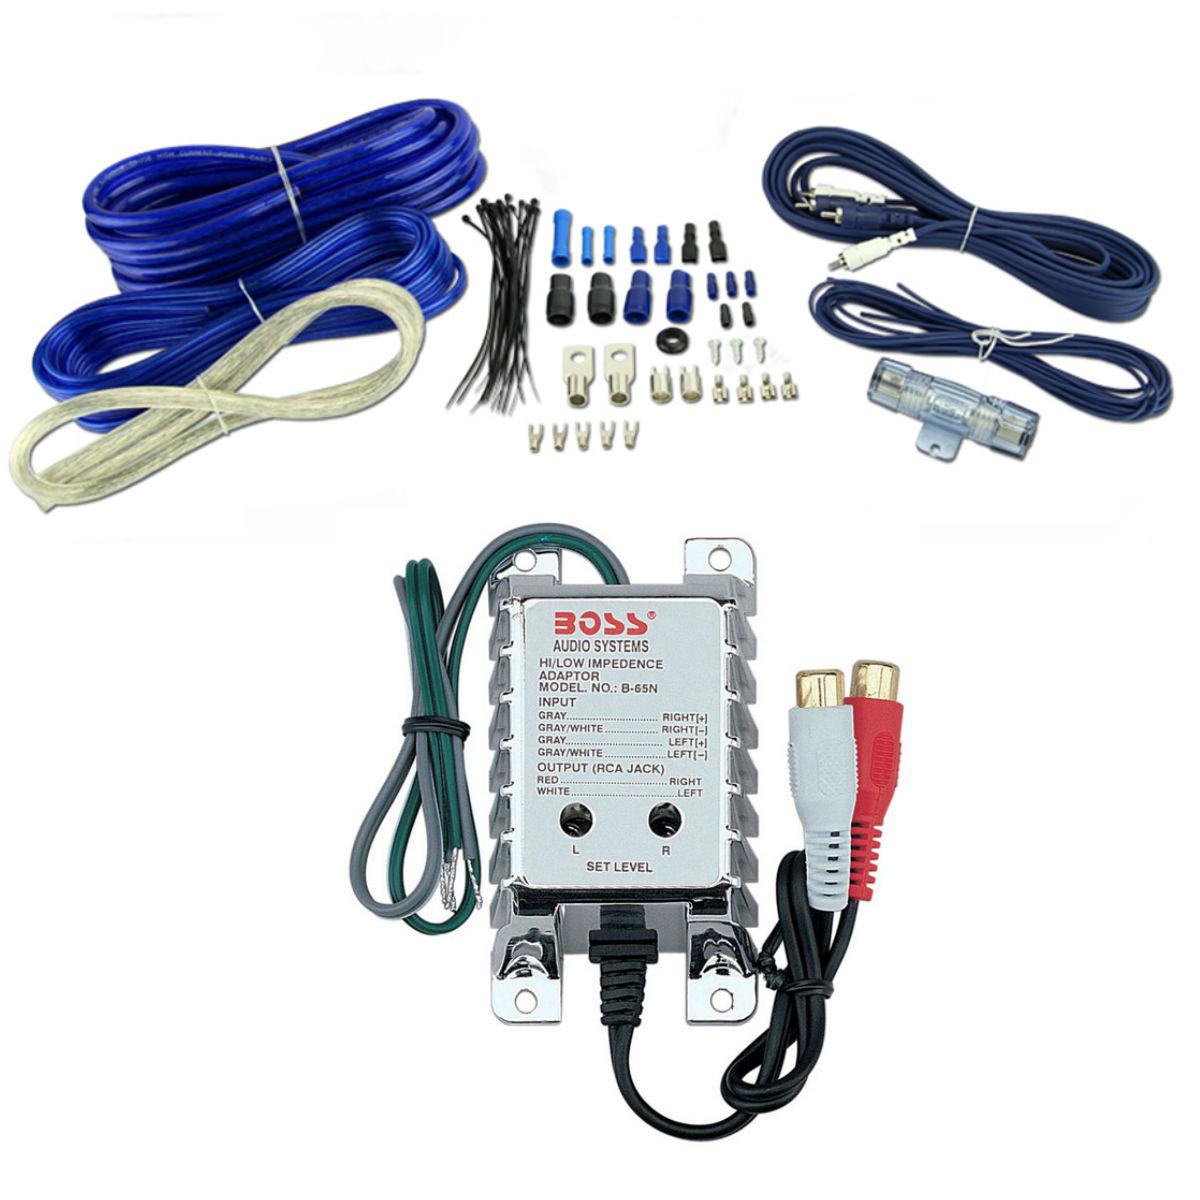 Vm Audio 4 Gauge Amplifier Wiring Kit W 3 Farad Power Capacitor Amp Pyramid 8ga Car Installation Wire